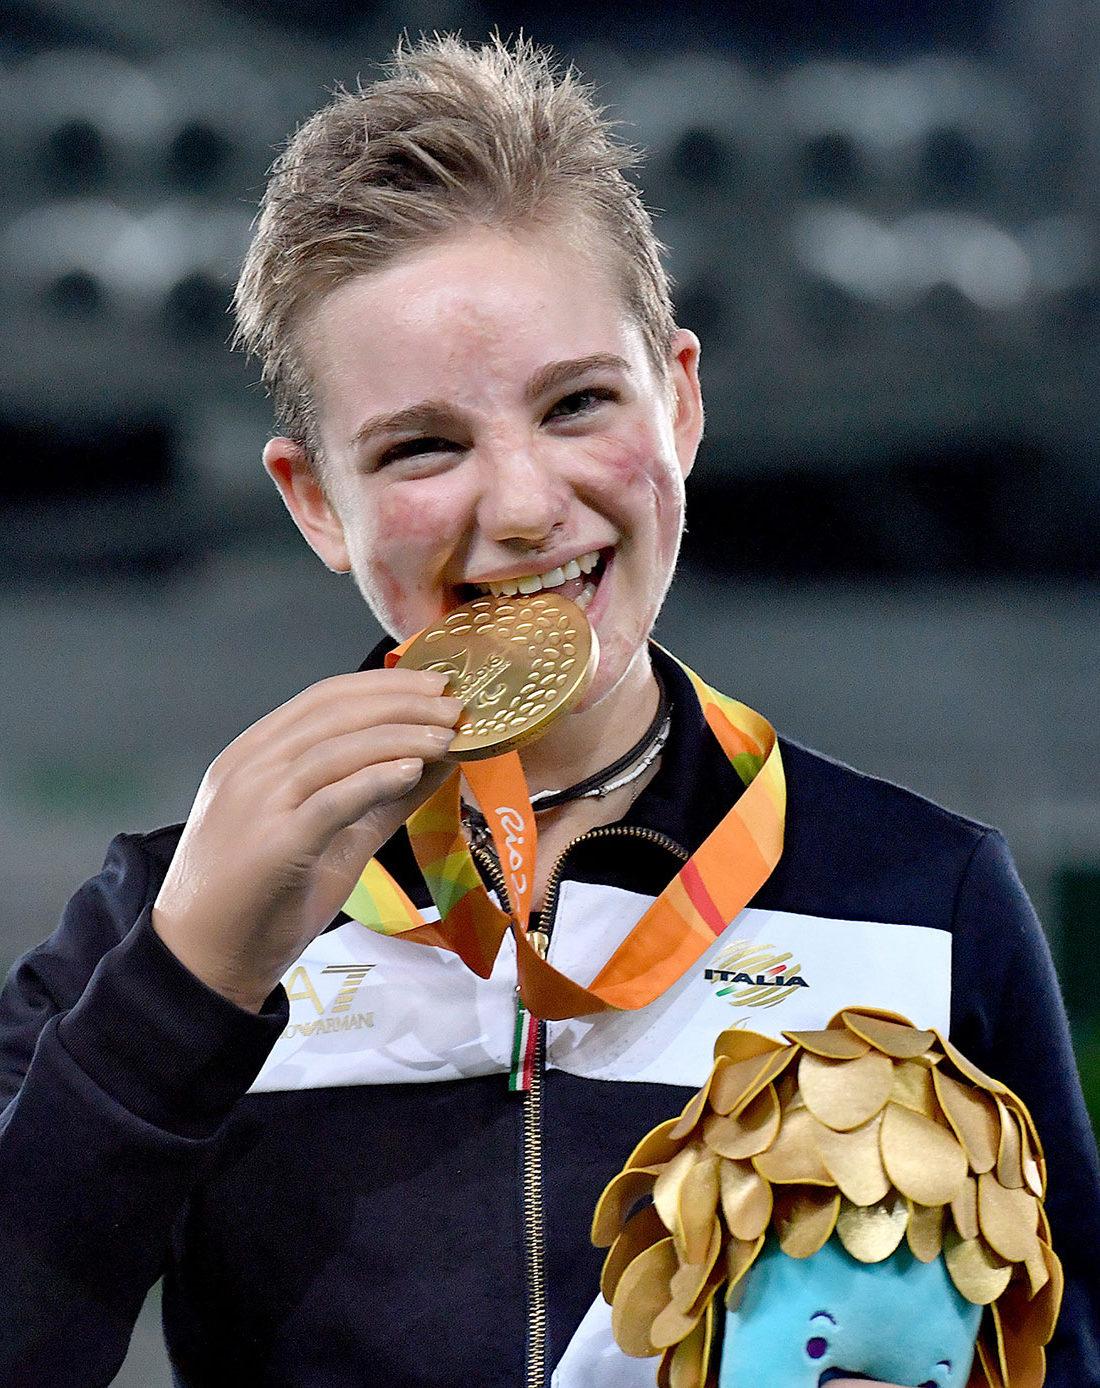 Beatrice Vio, Paralympics Gold Medalist